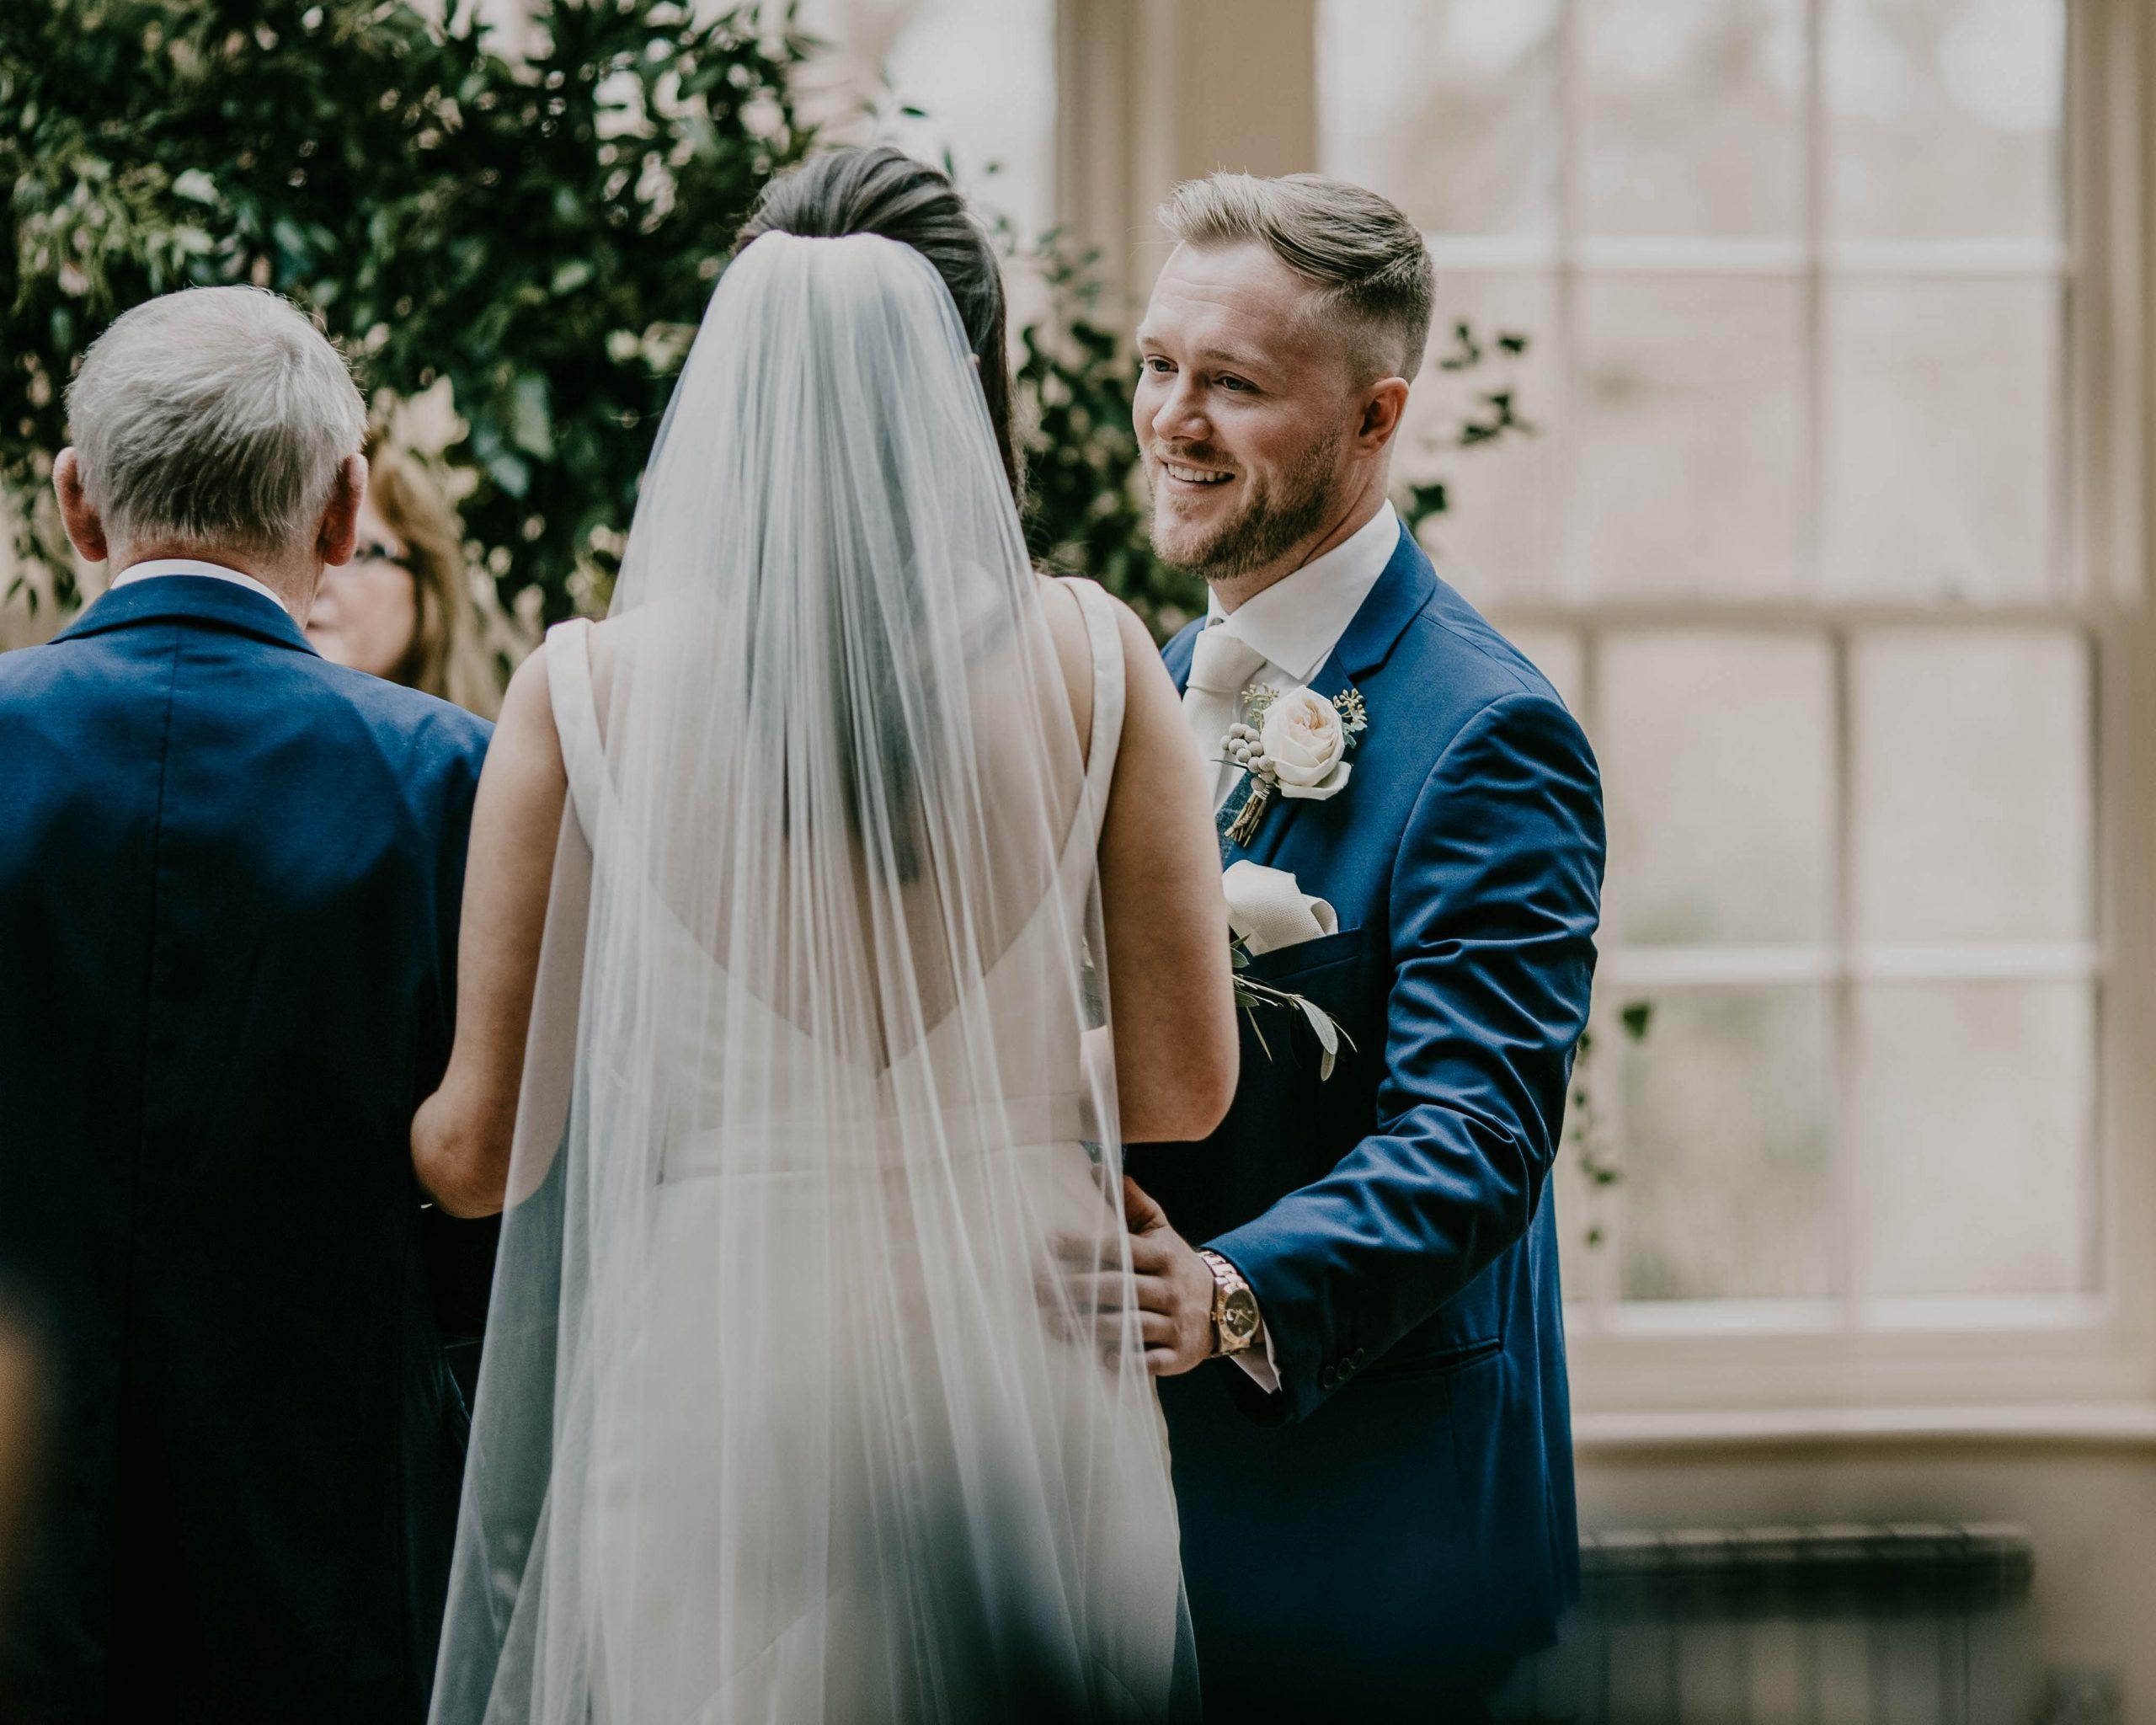 wedding at Mitton Hall in lancashire